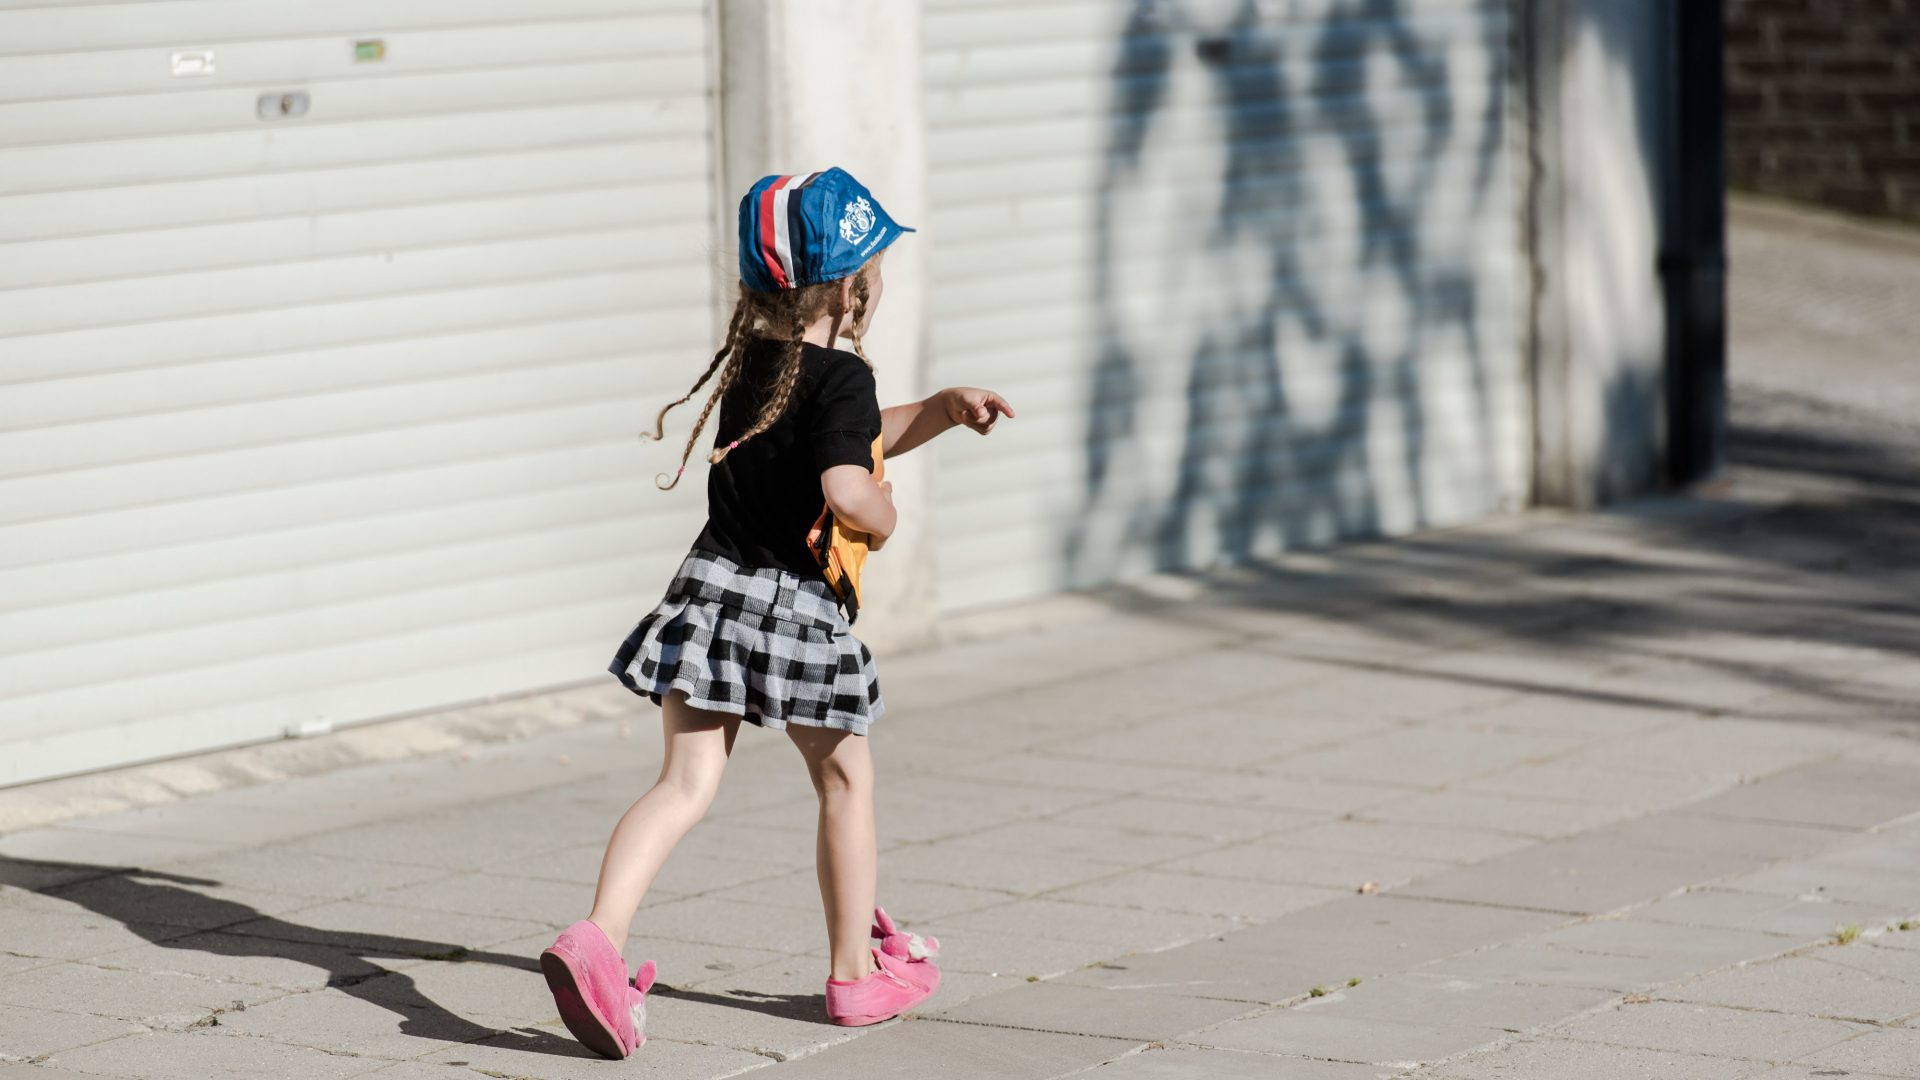 Home – 1 – lopend kind